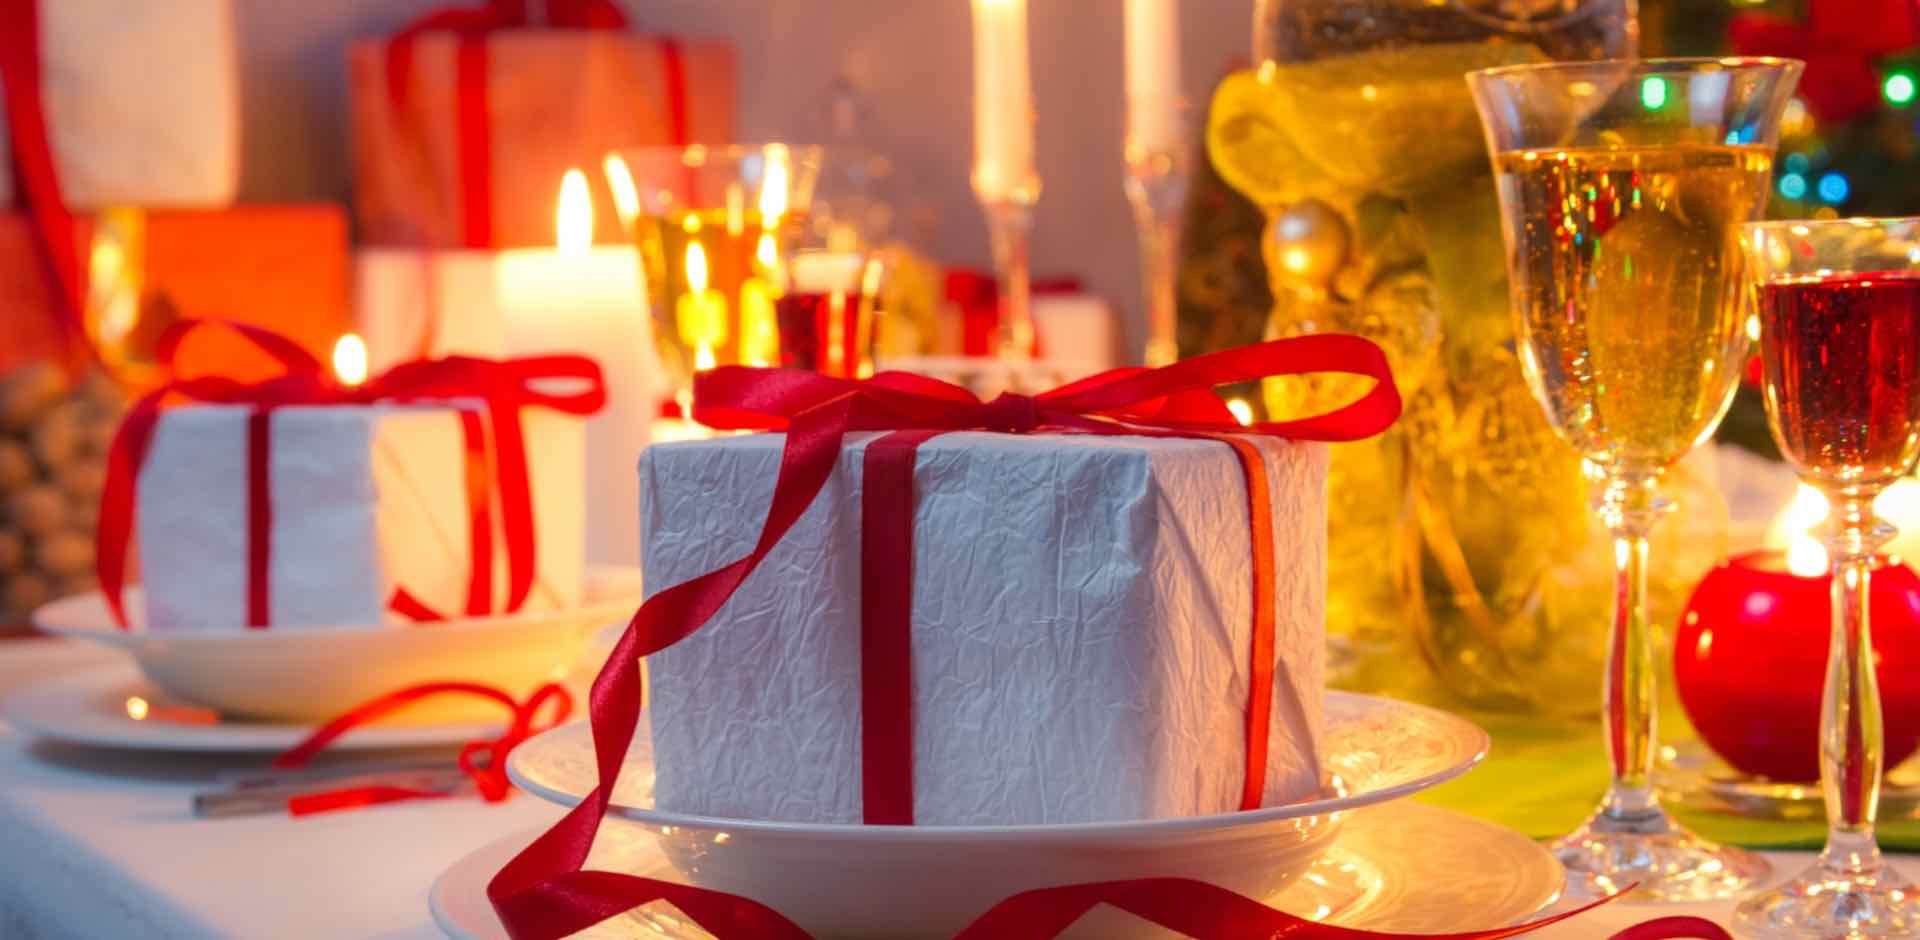 Tavola - Natale - omino - panpepato - Gustorotondo - spesa online